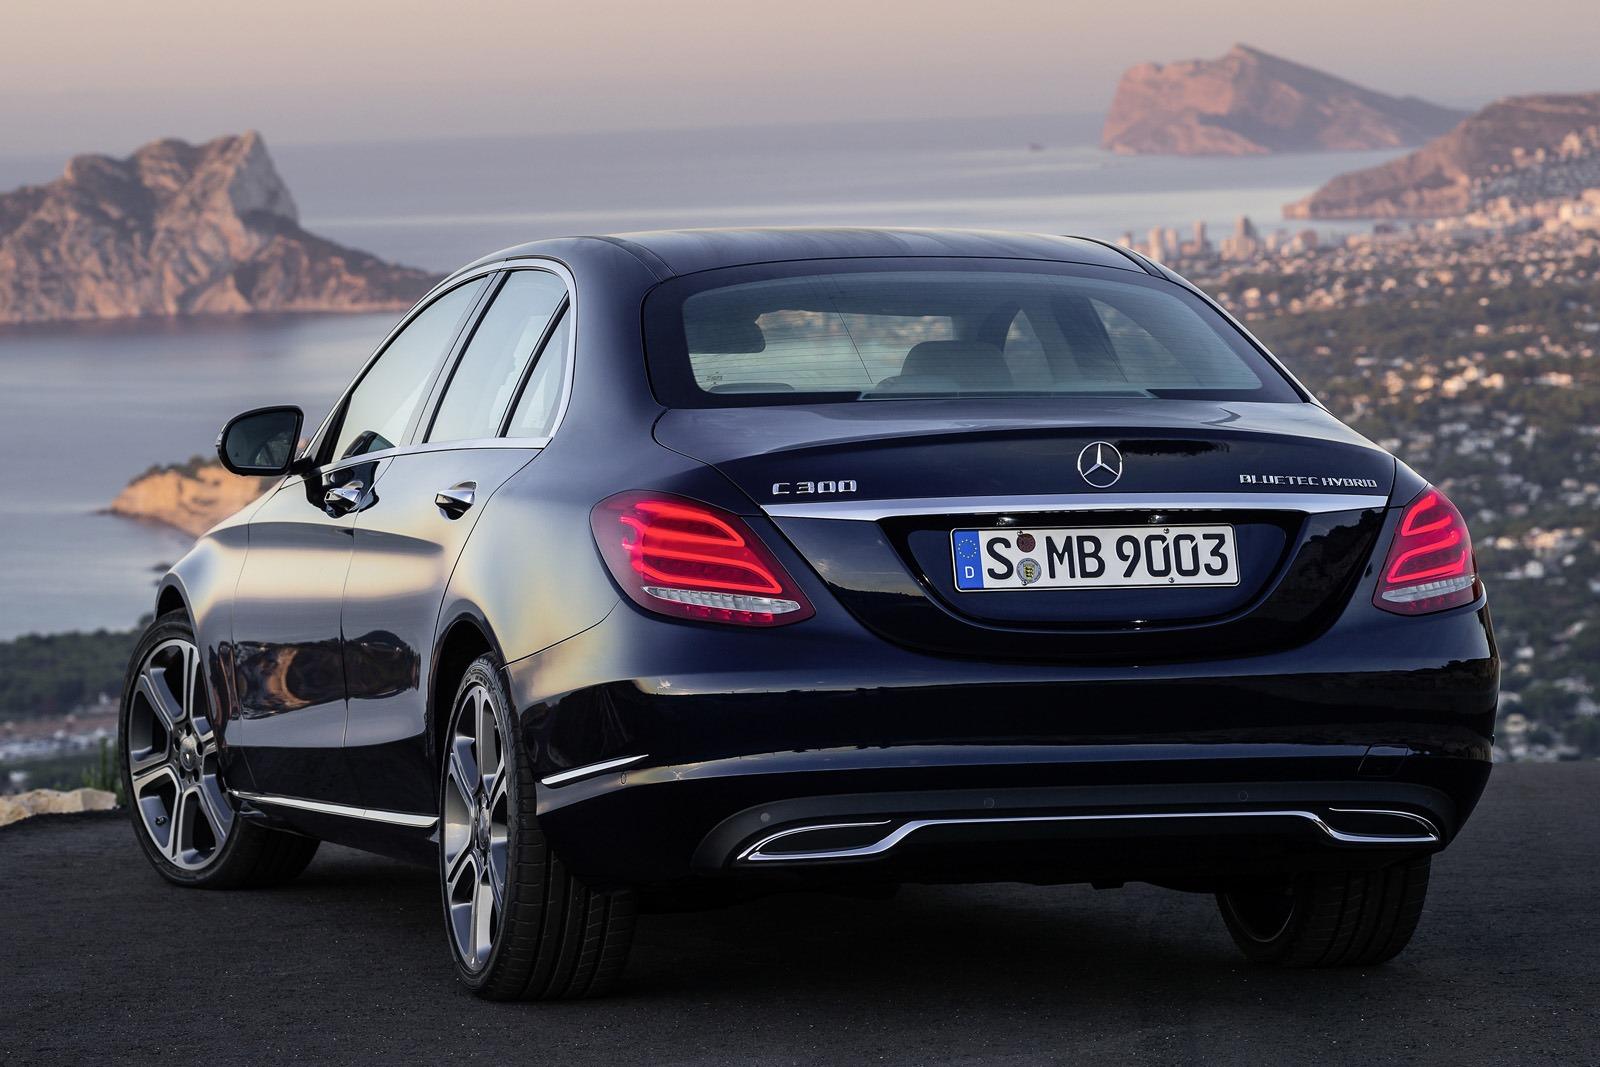 Mercedes-Benz Classe C - recall